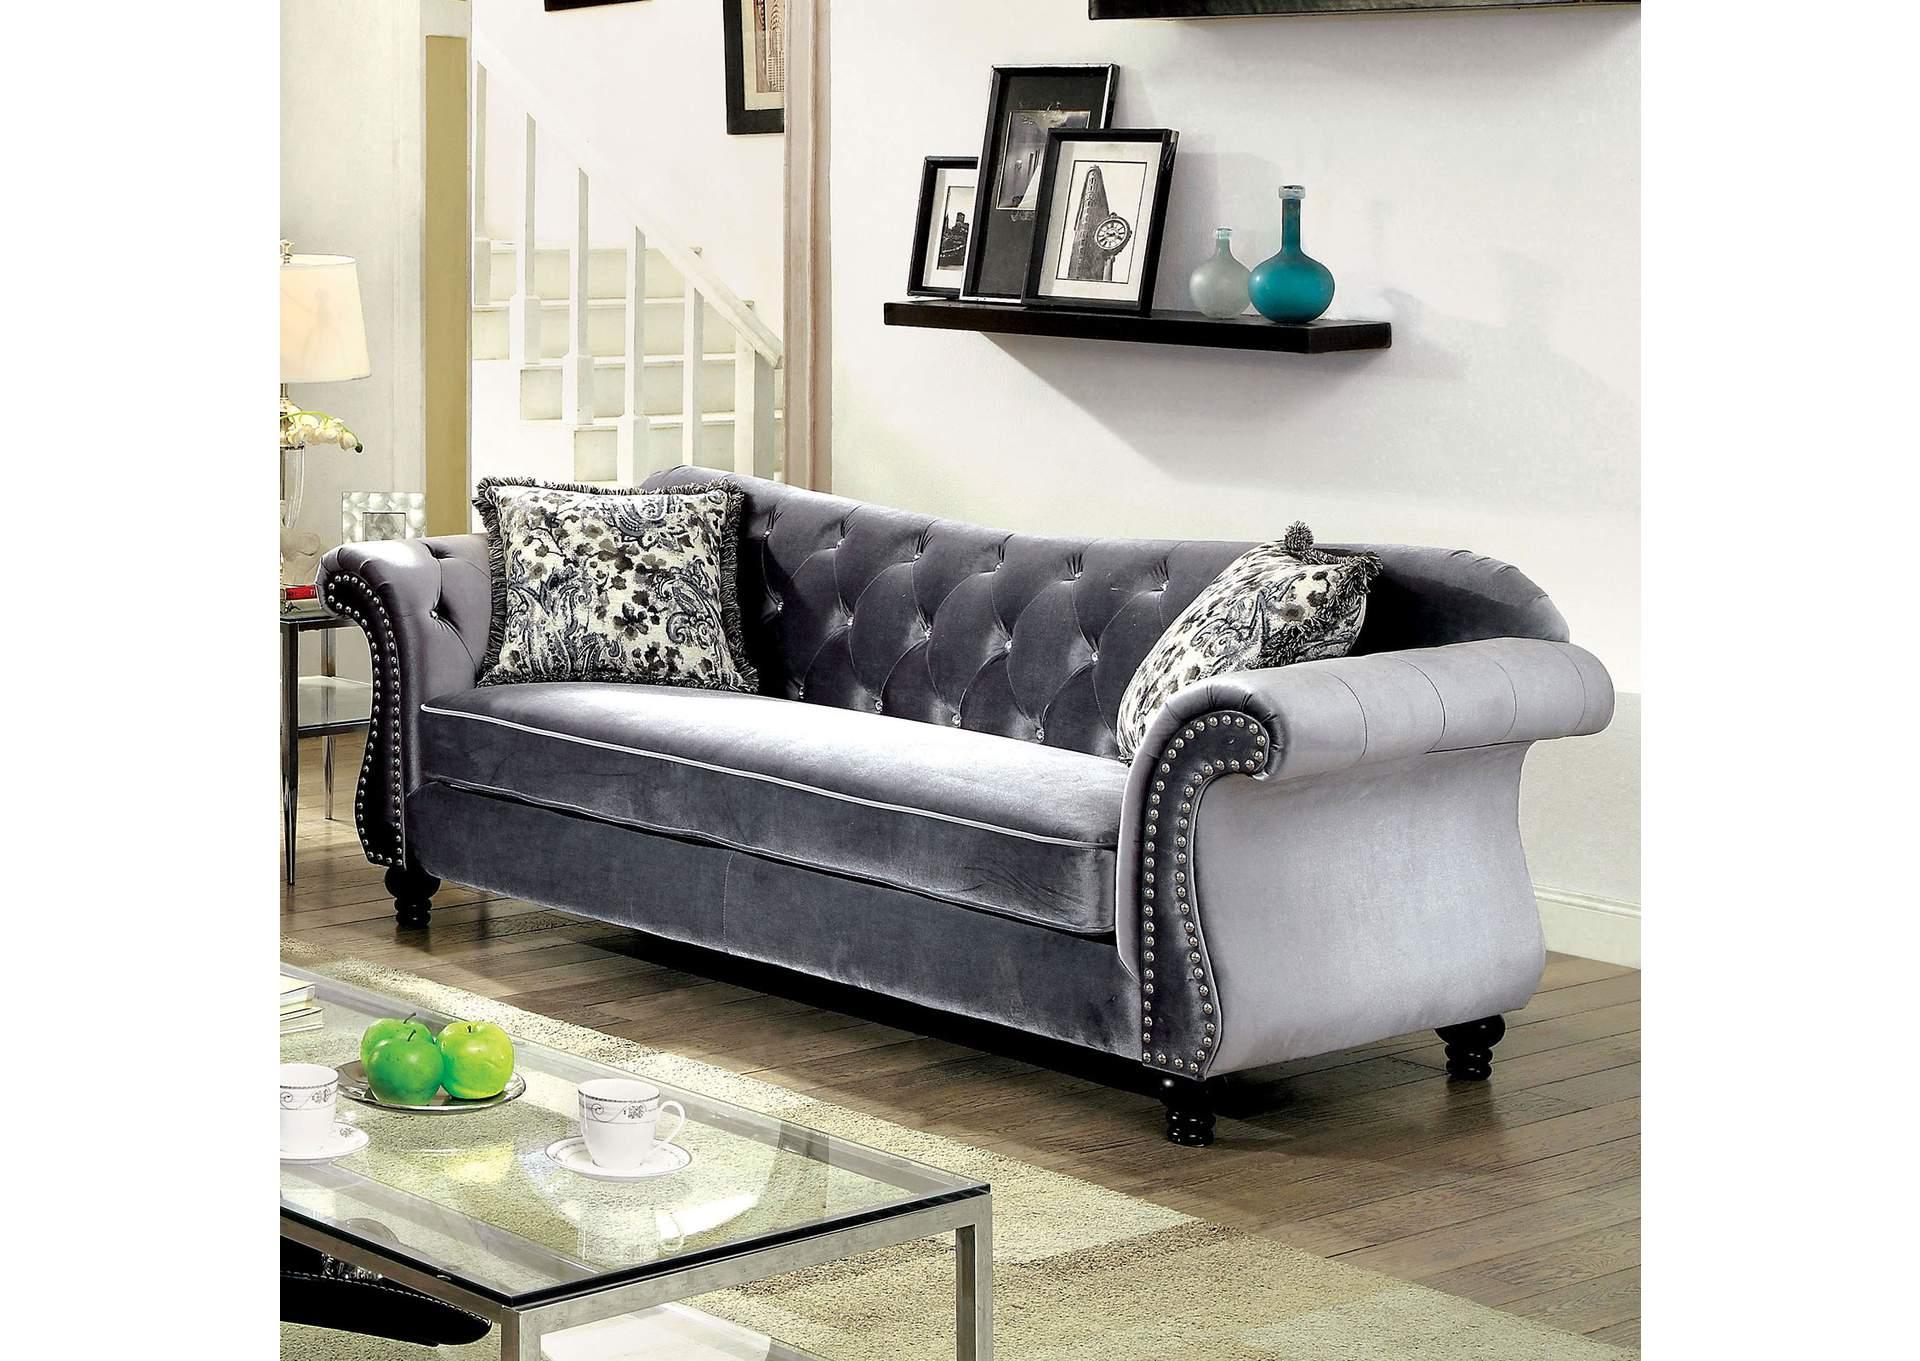 Broadway Furniture Jolanda Gray Curved-Back Sofa